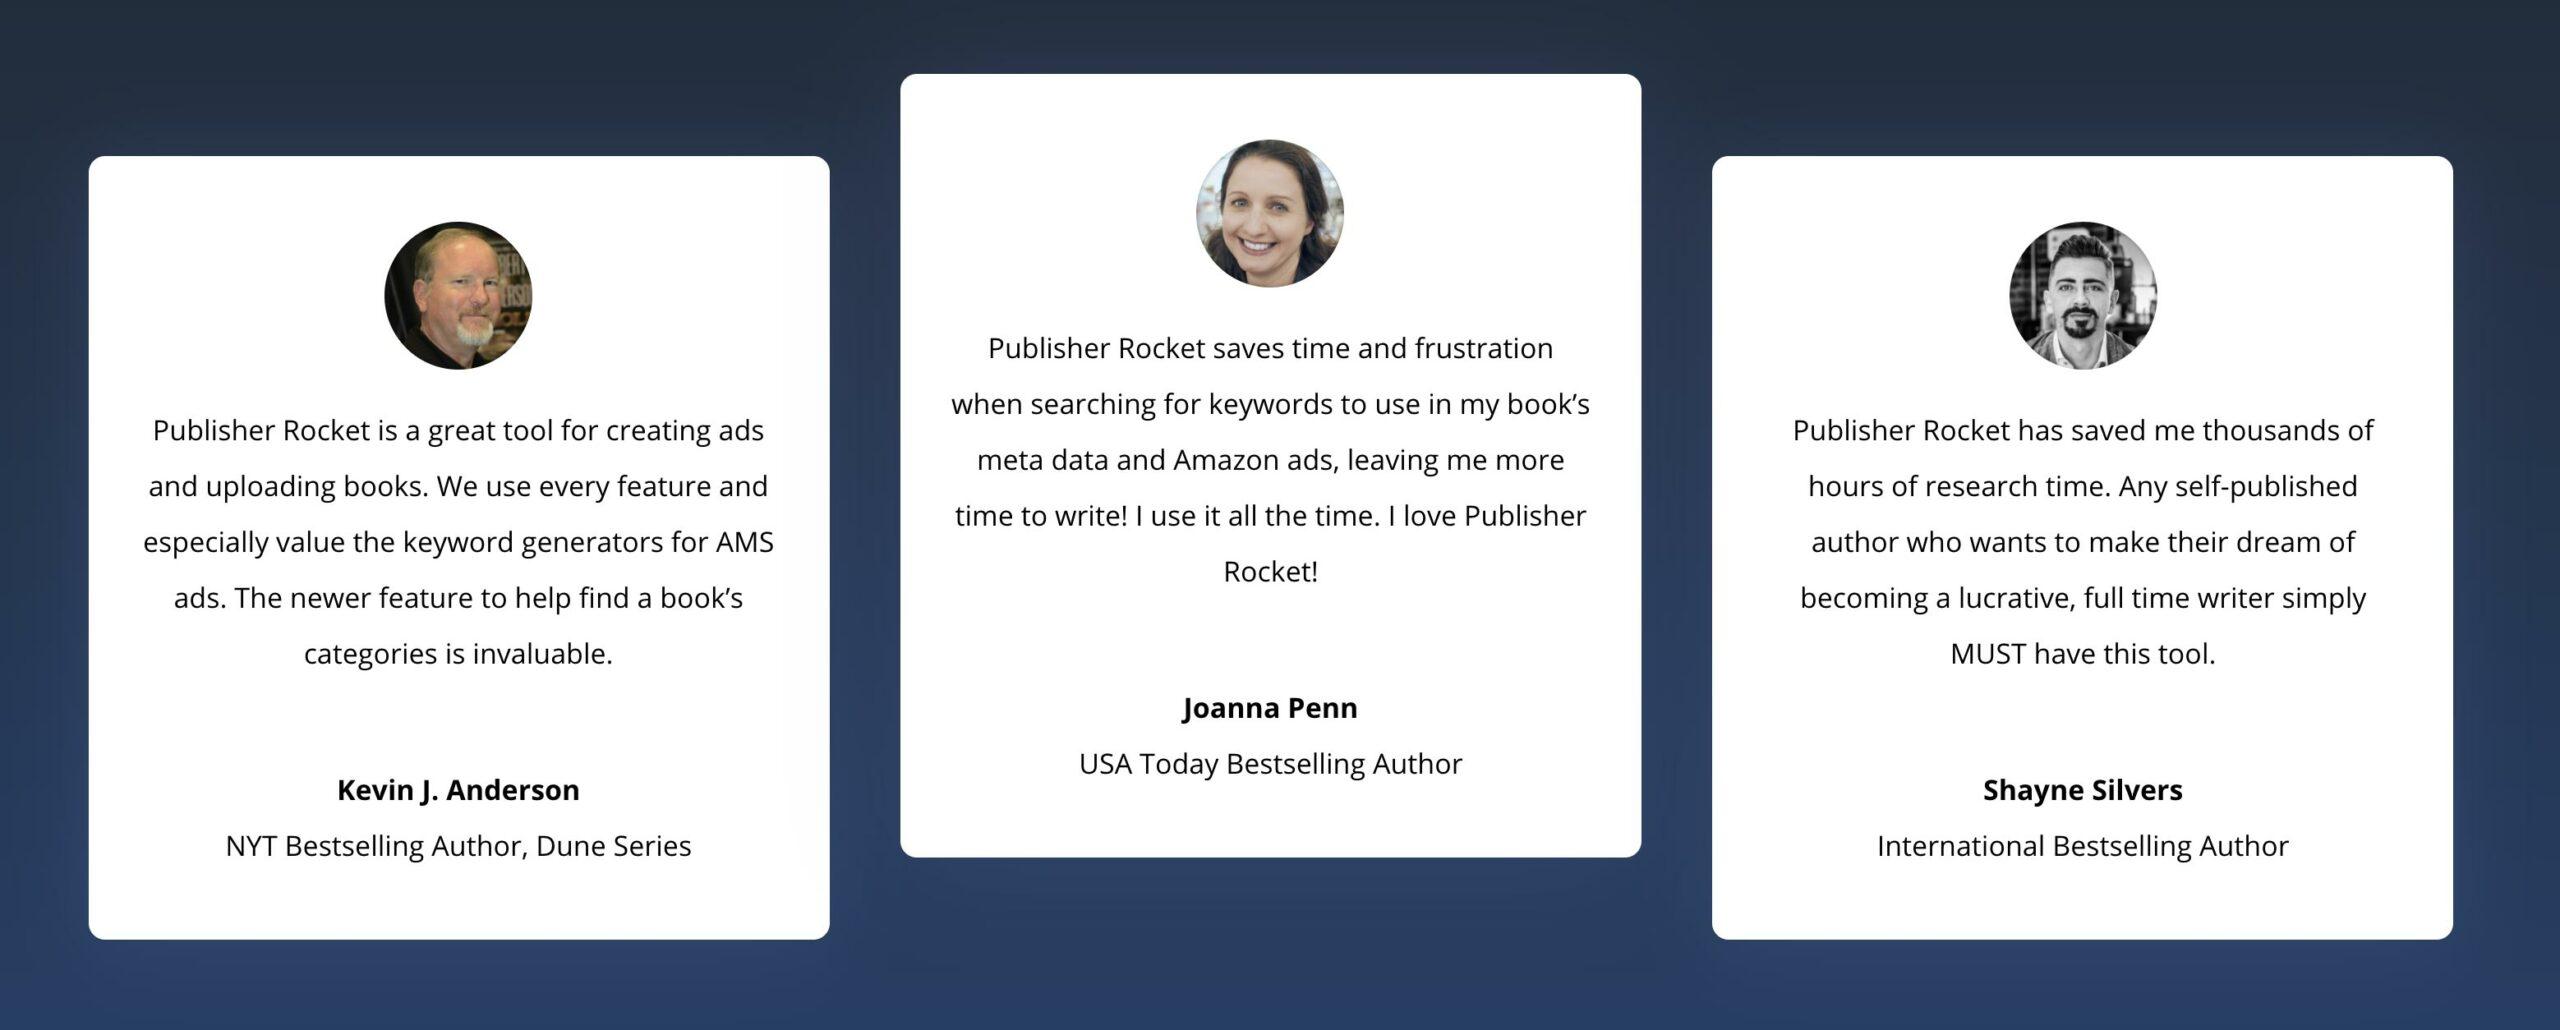 publisher rocket testimonials